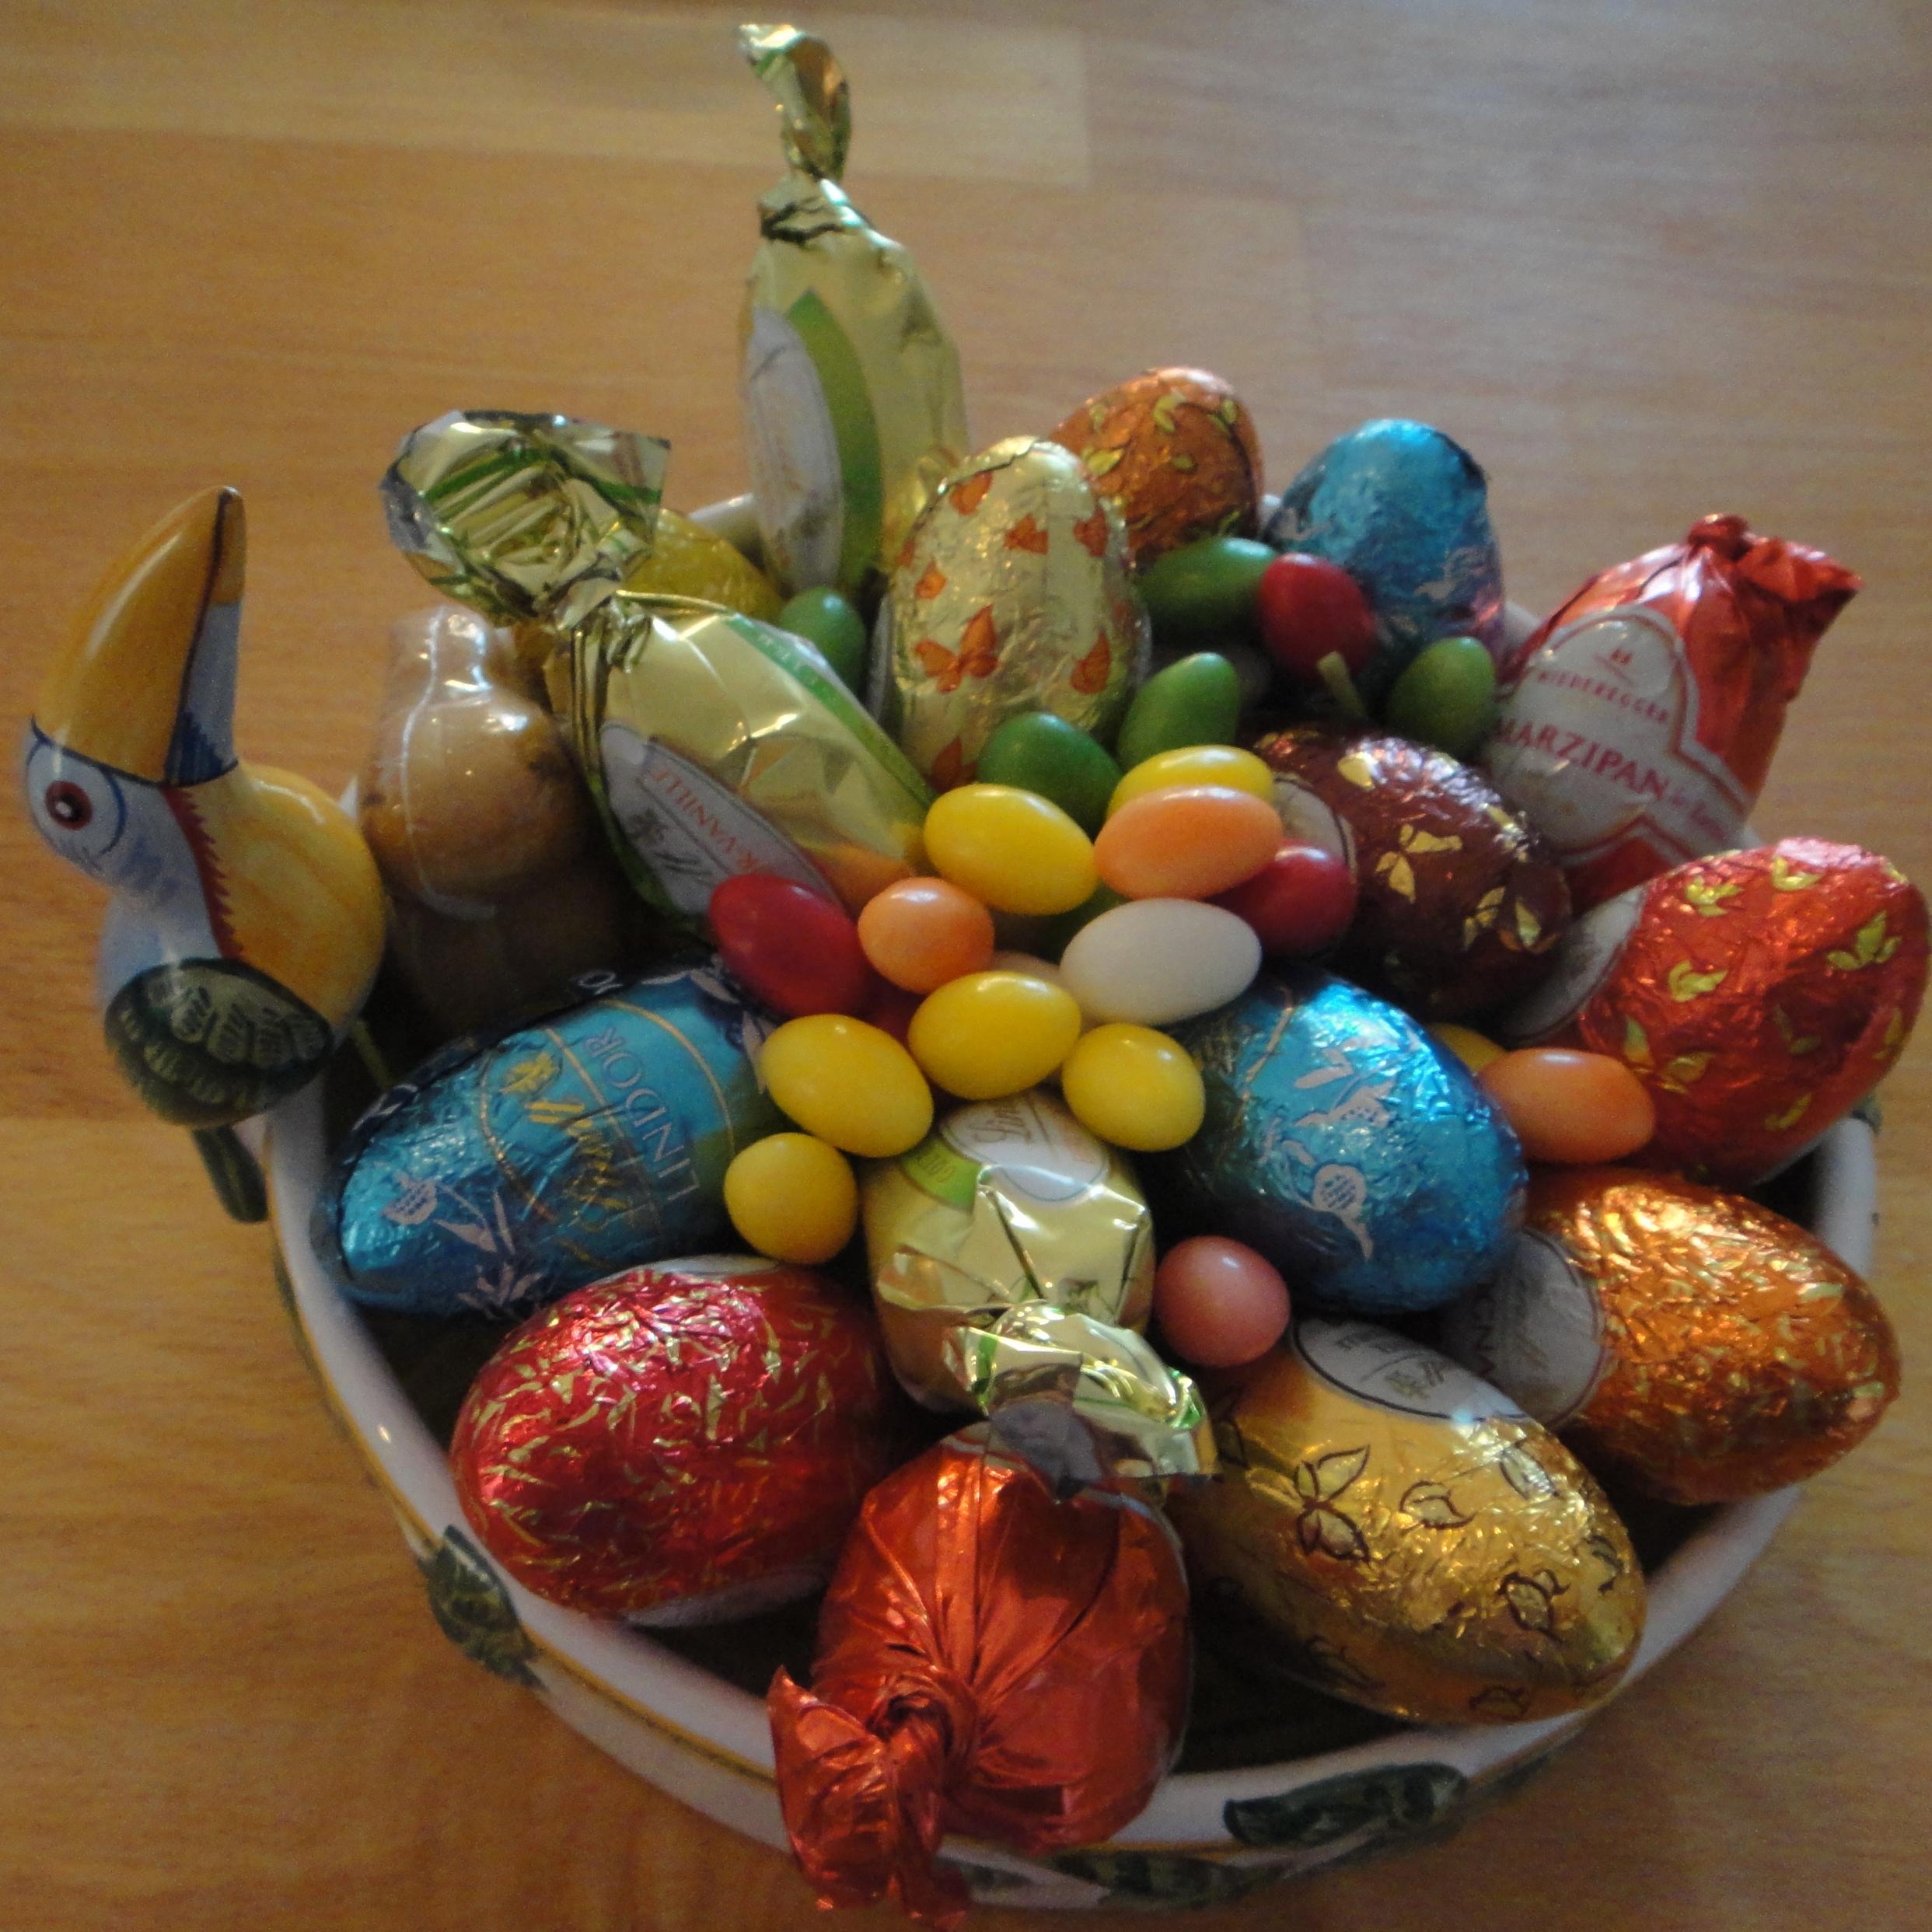 more chocolate Easter eggs / noch mehr Schokoladen Ostereier